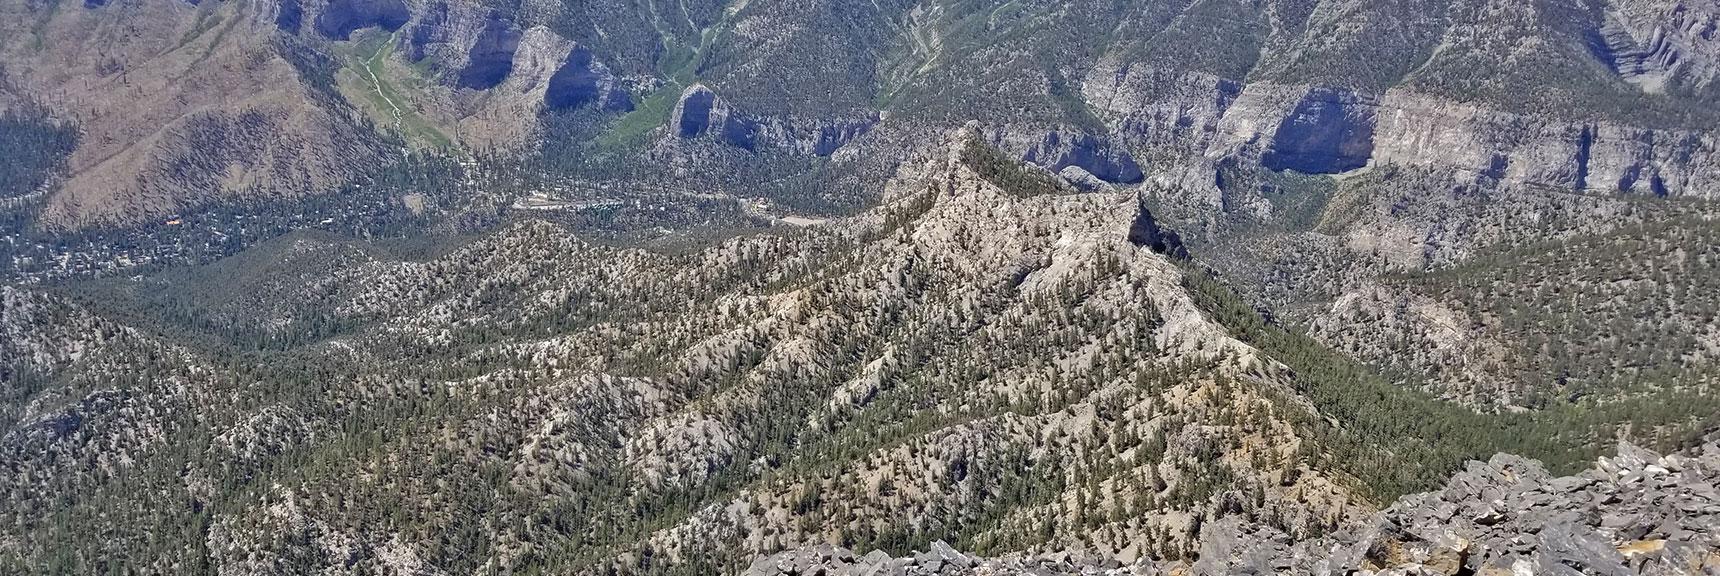 Cockscomb Ridge and Charleston Village Viewed from Mummy's Toe Summit  Mummy Mountain's Toe, Mt. Charleston Wilderness, Nevada